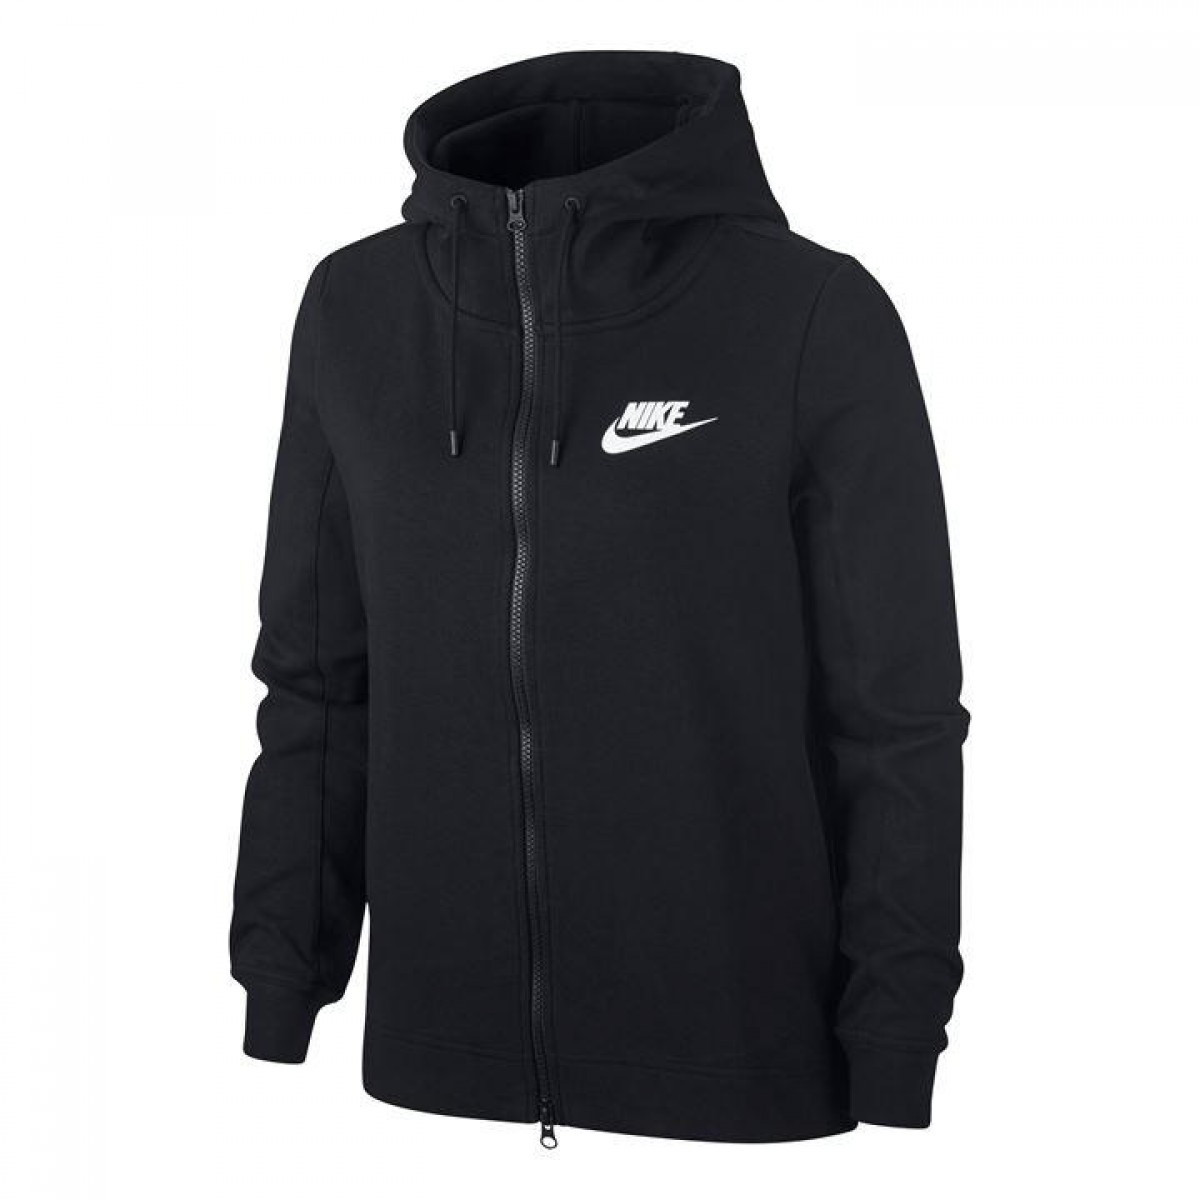 761b22f6 Толстовка Nike Optic Black - Оригинал, цена 2 699 грн., купить в ...